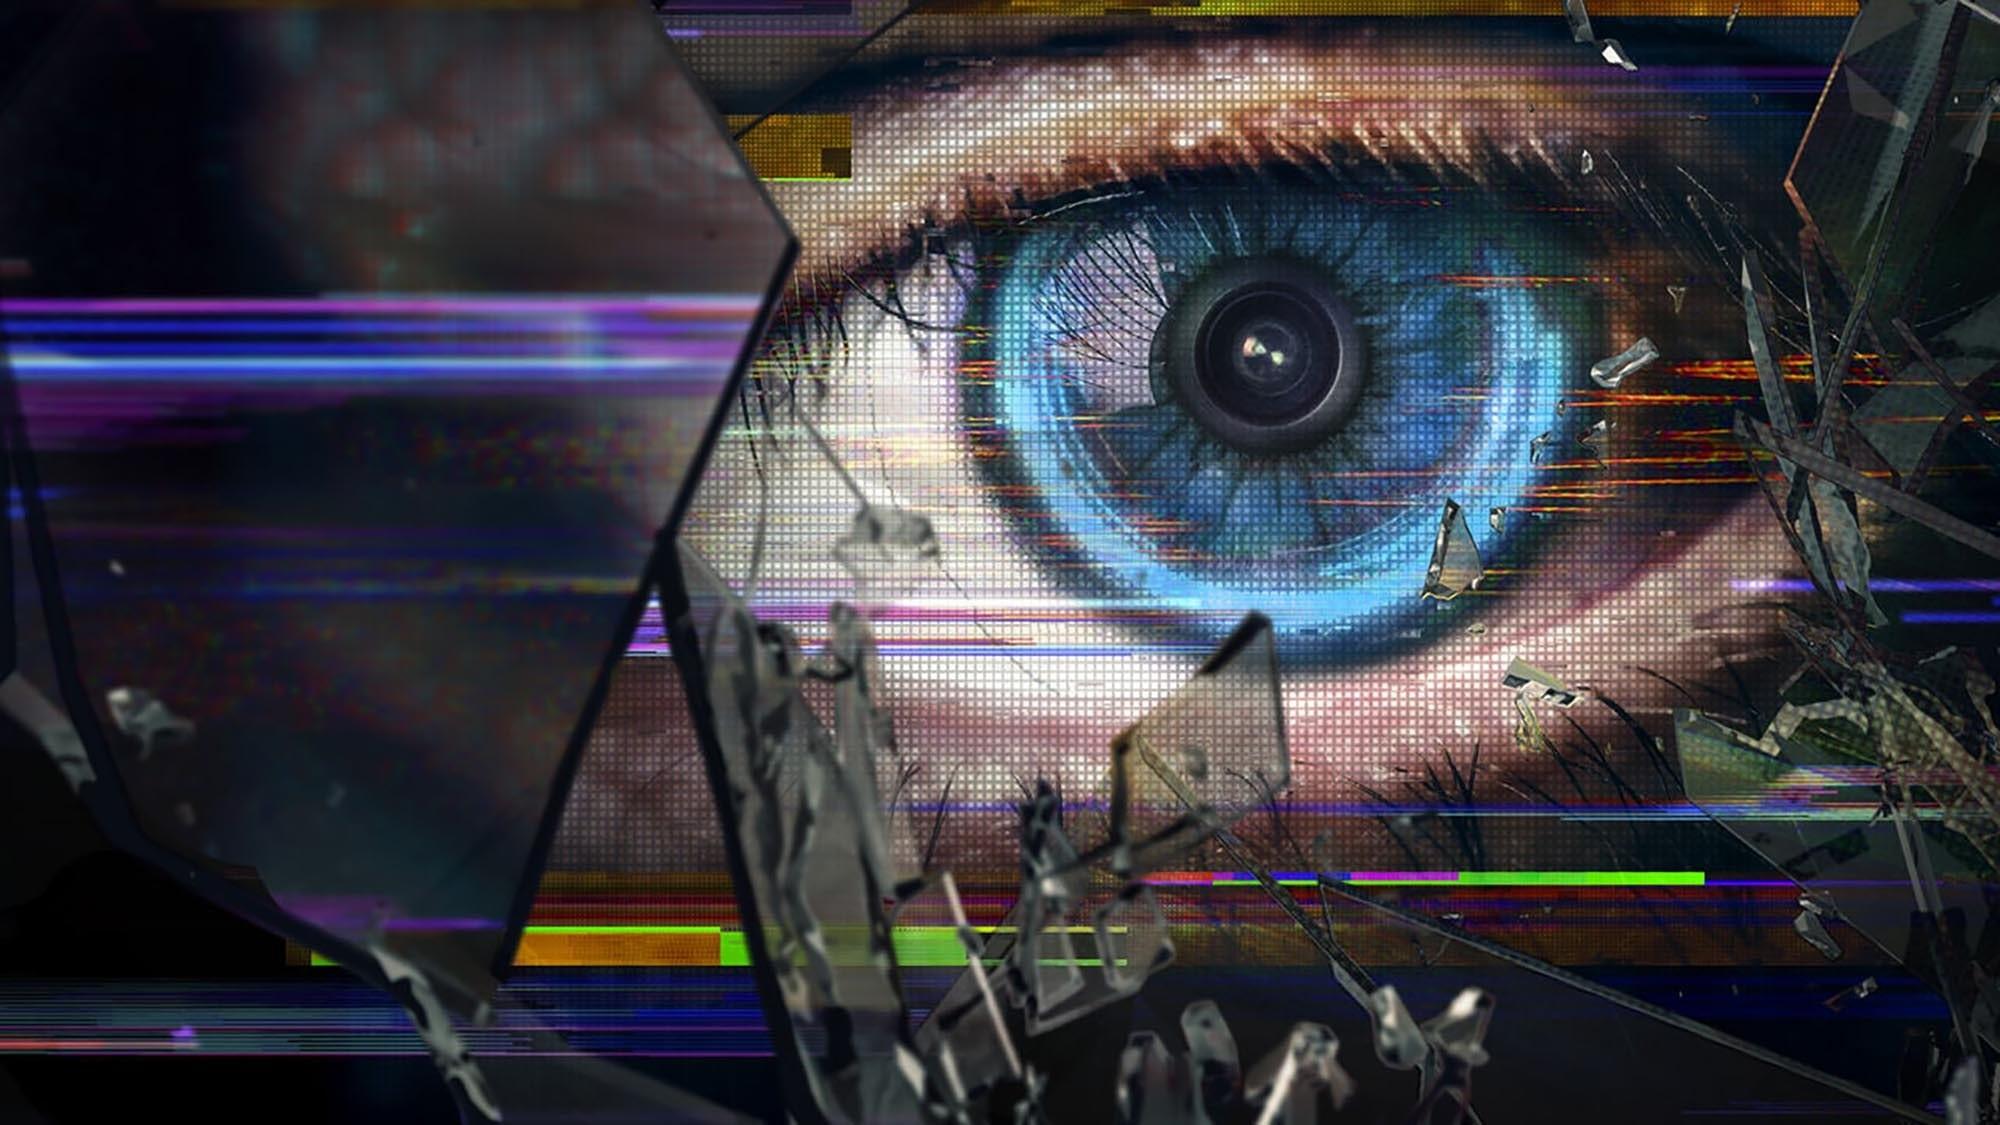 black mirror hd wallpaper | background image | 2000x1125 | id:902698